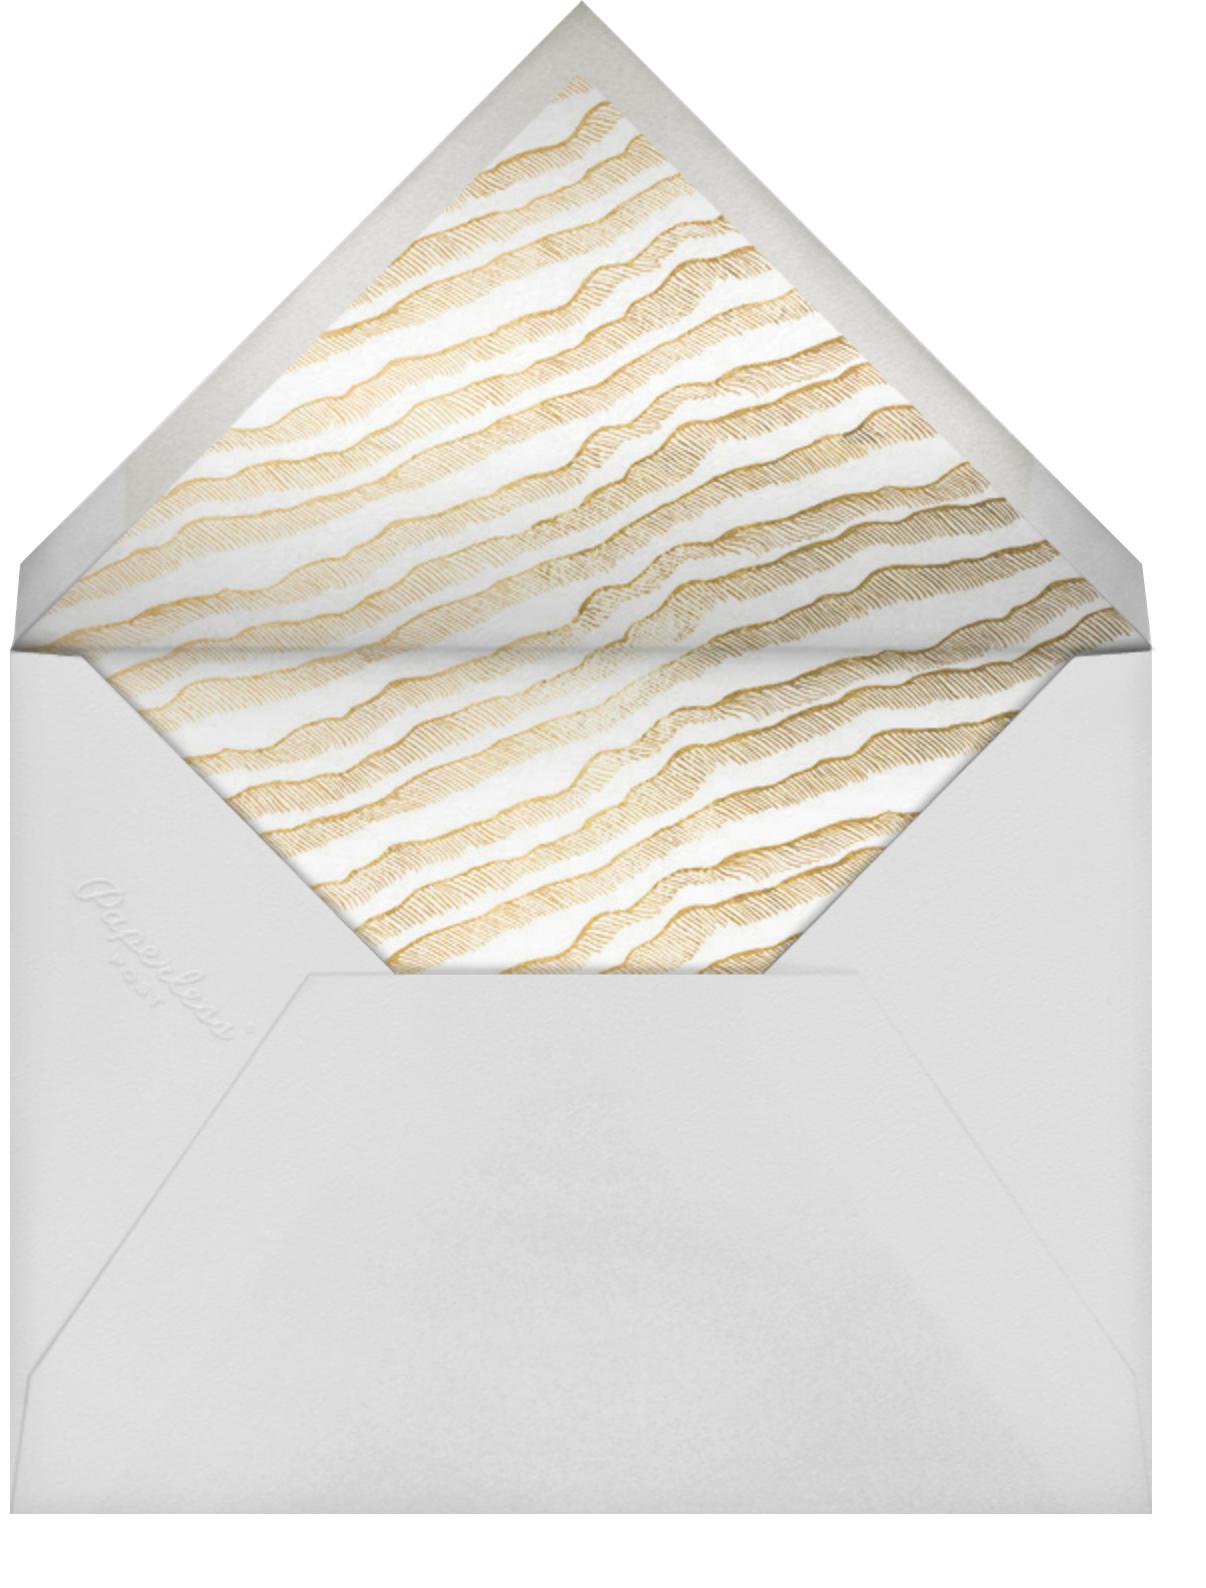 Fosse - Kelly Wearstler - Save the date - envelope back